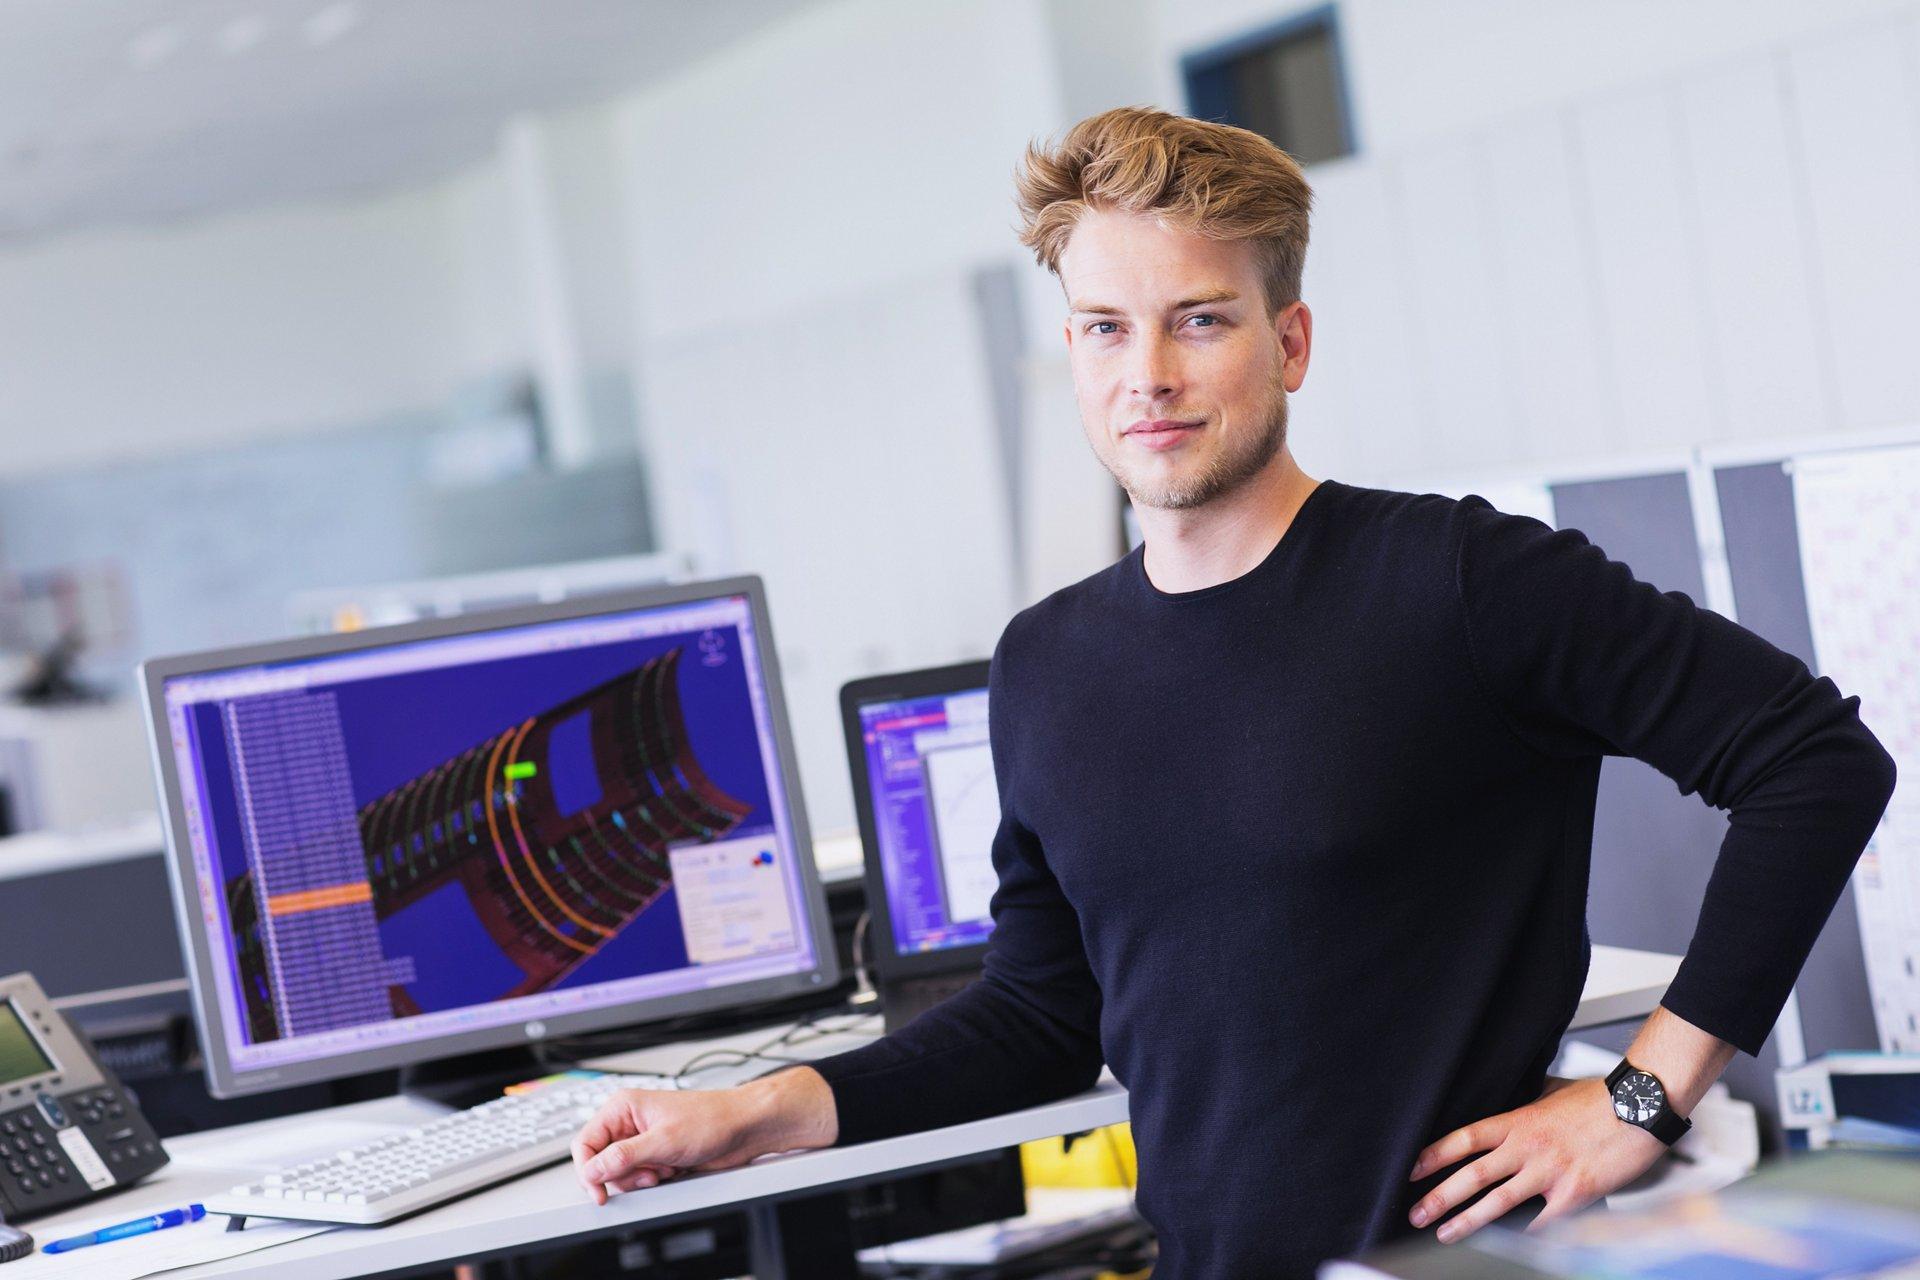 Das ist Gregor, Structure Design Engineer